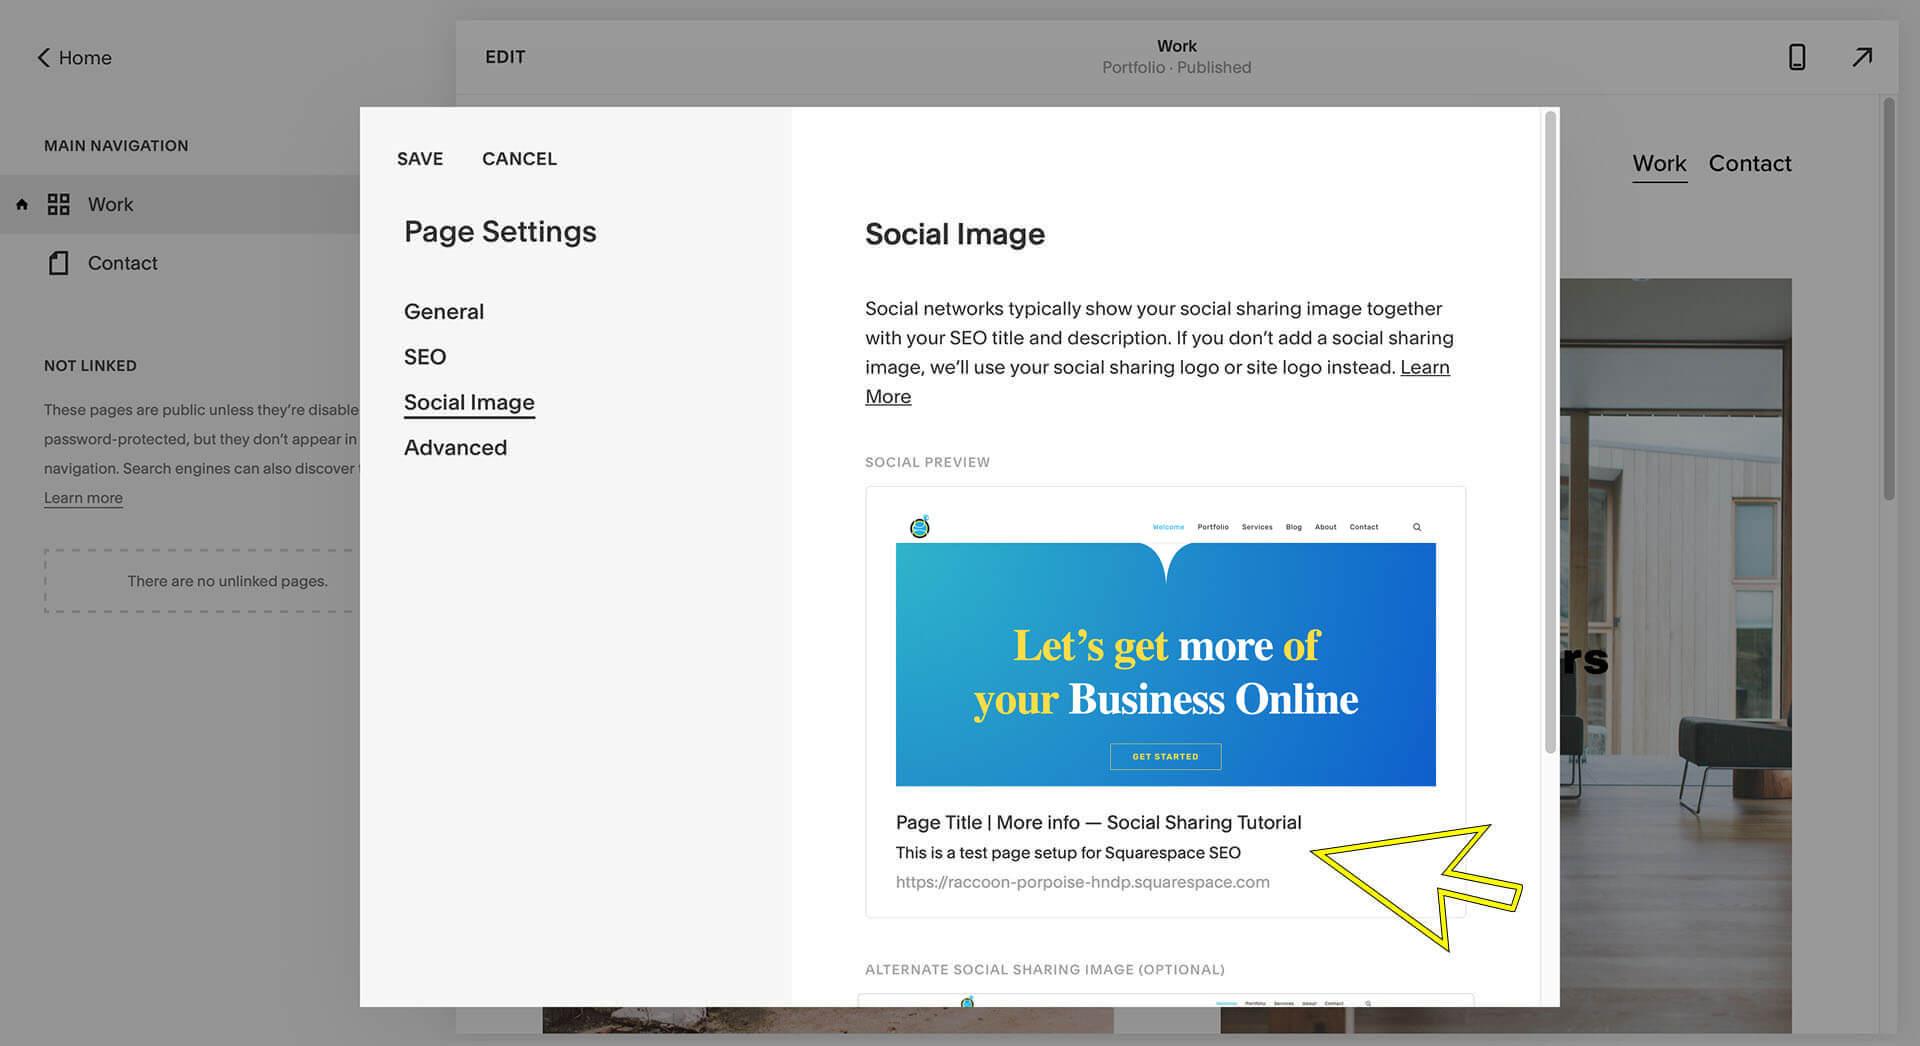 squarespace social sharing image tutorial image, social image